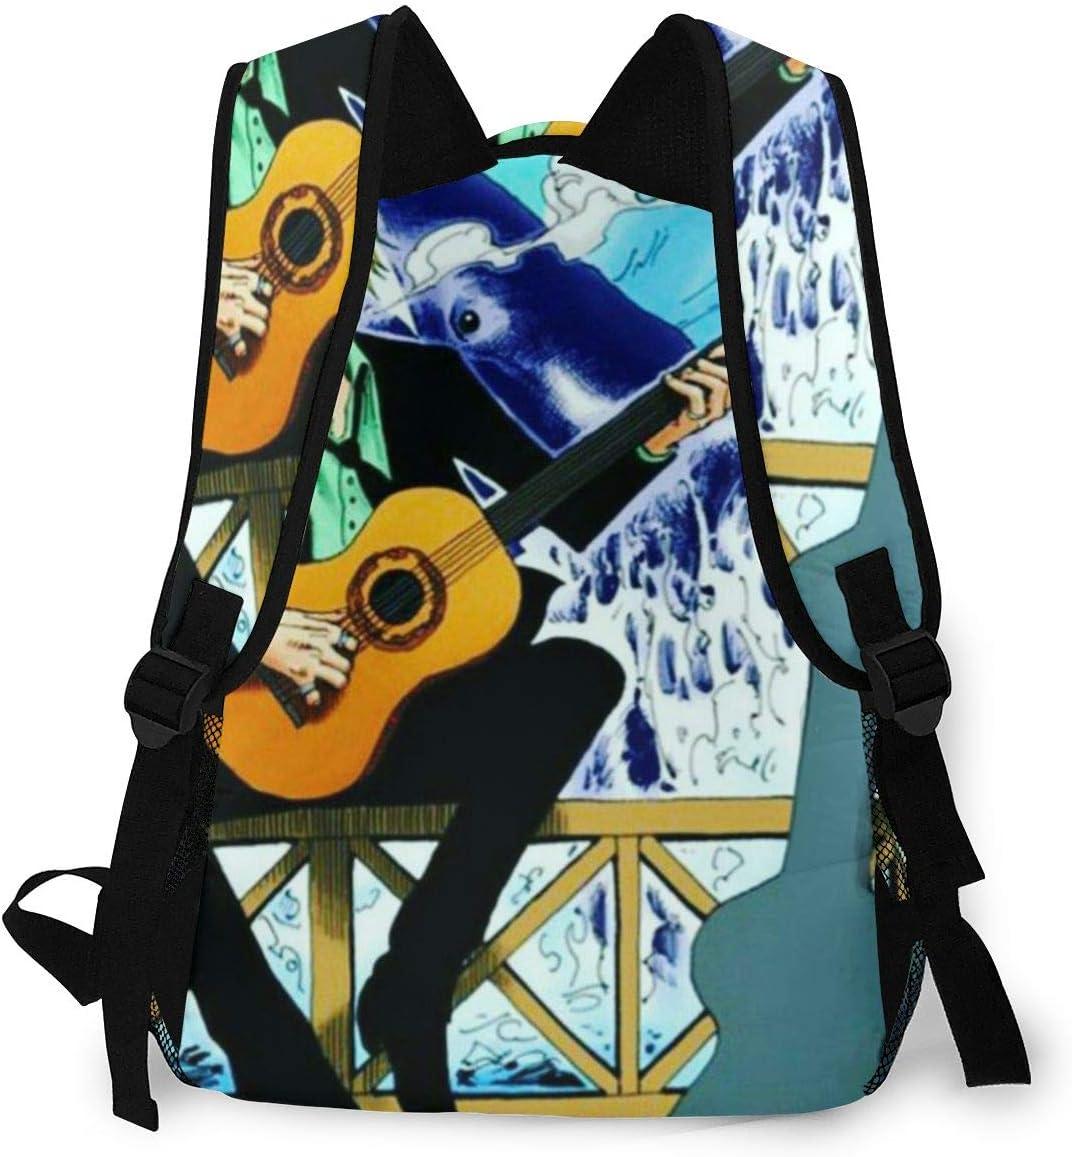 Laptop Bag Sports Traveling Daypack 16 x 11.5 x 8 in Vinsmoke Sanji School Backpack for Girls and Boys